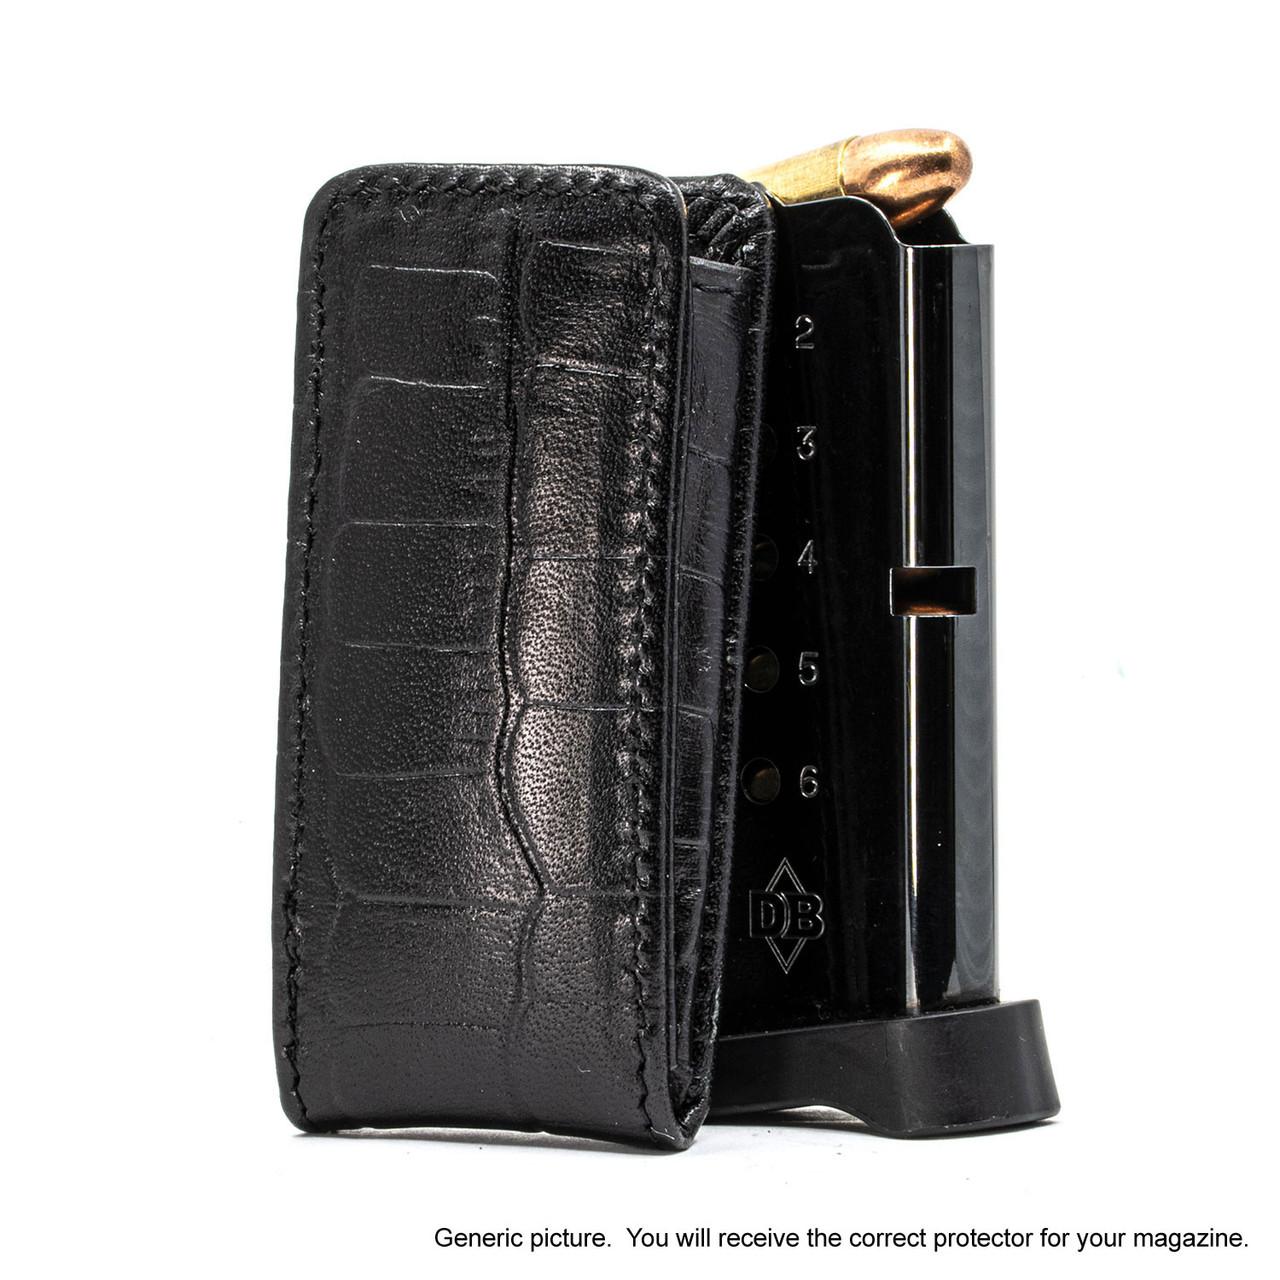 Remington RM380 Black Alligator Magazine Pocket Protector